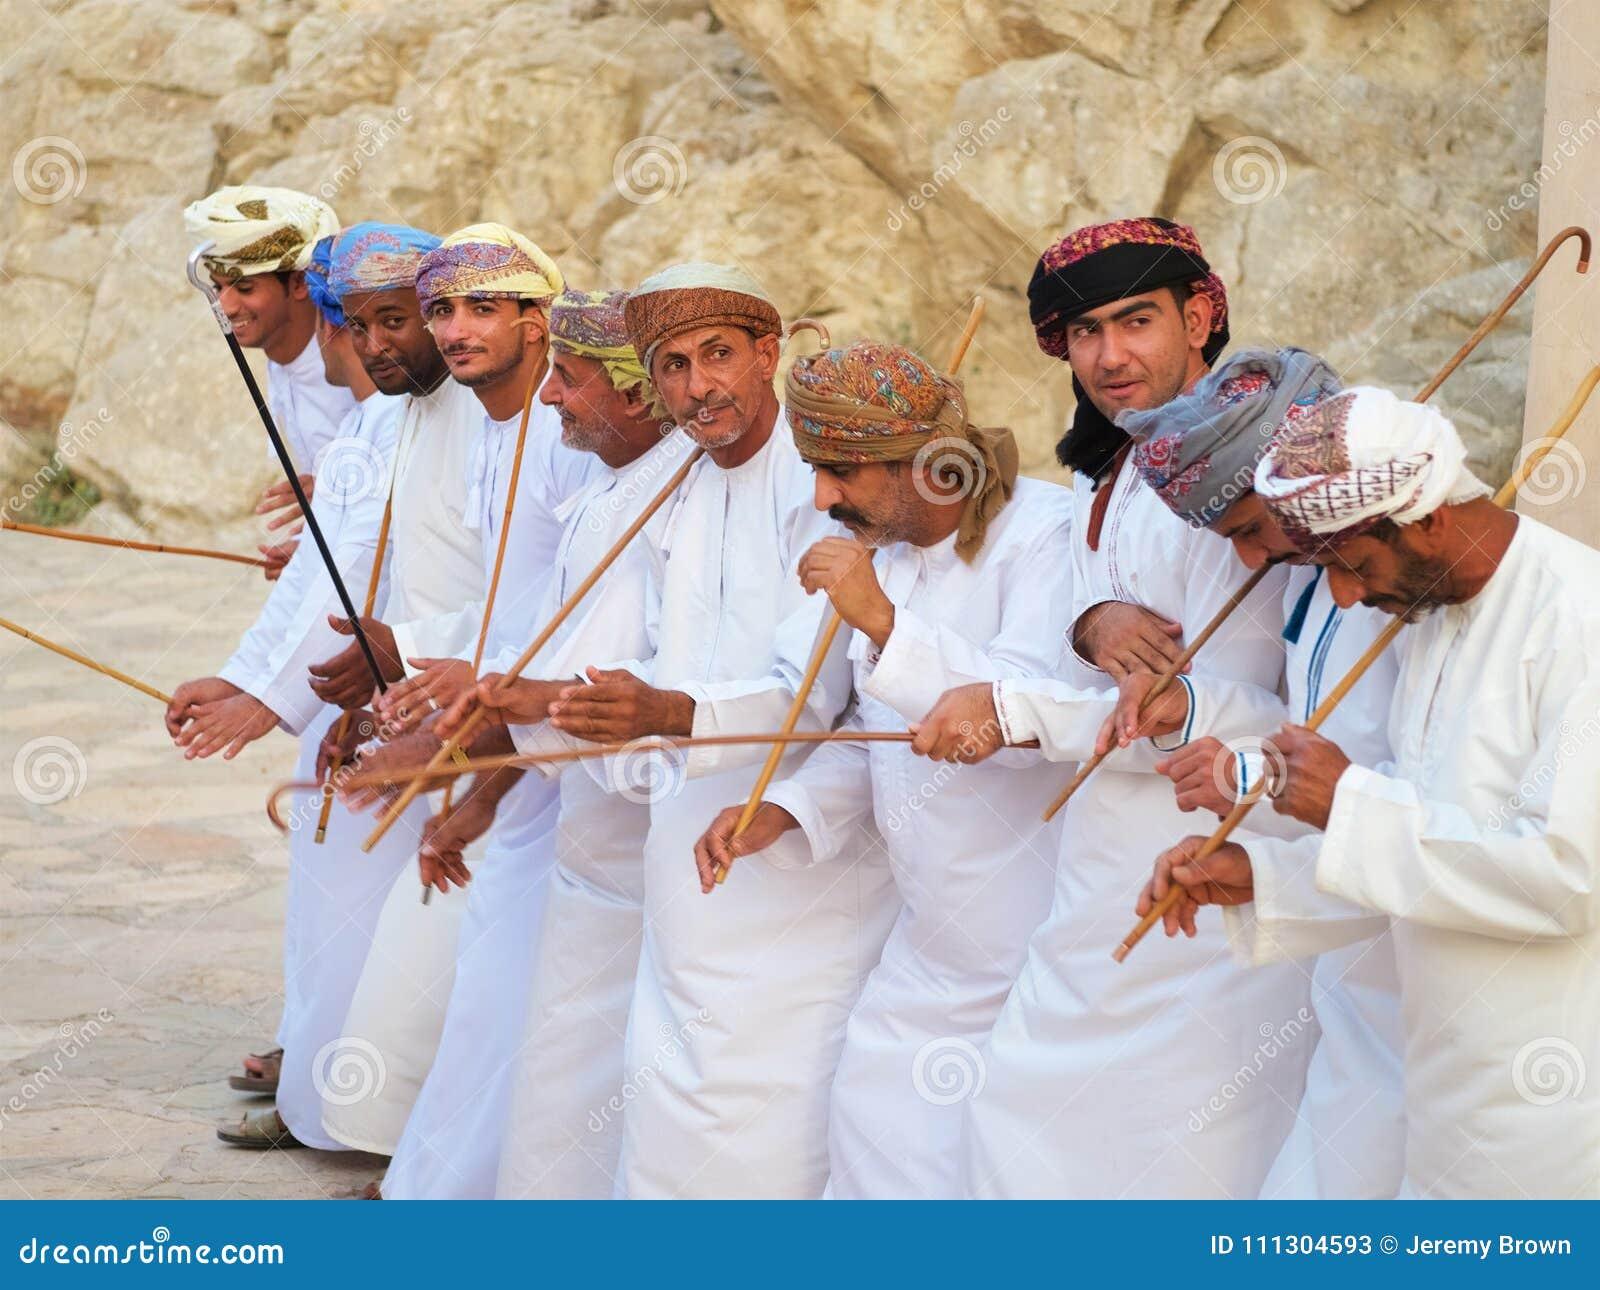 Arabic music editorial stock photo. Image of cord, entertainment.